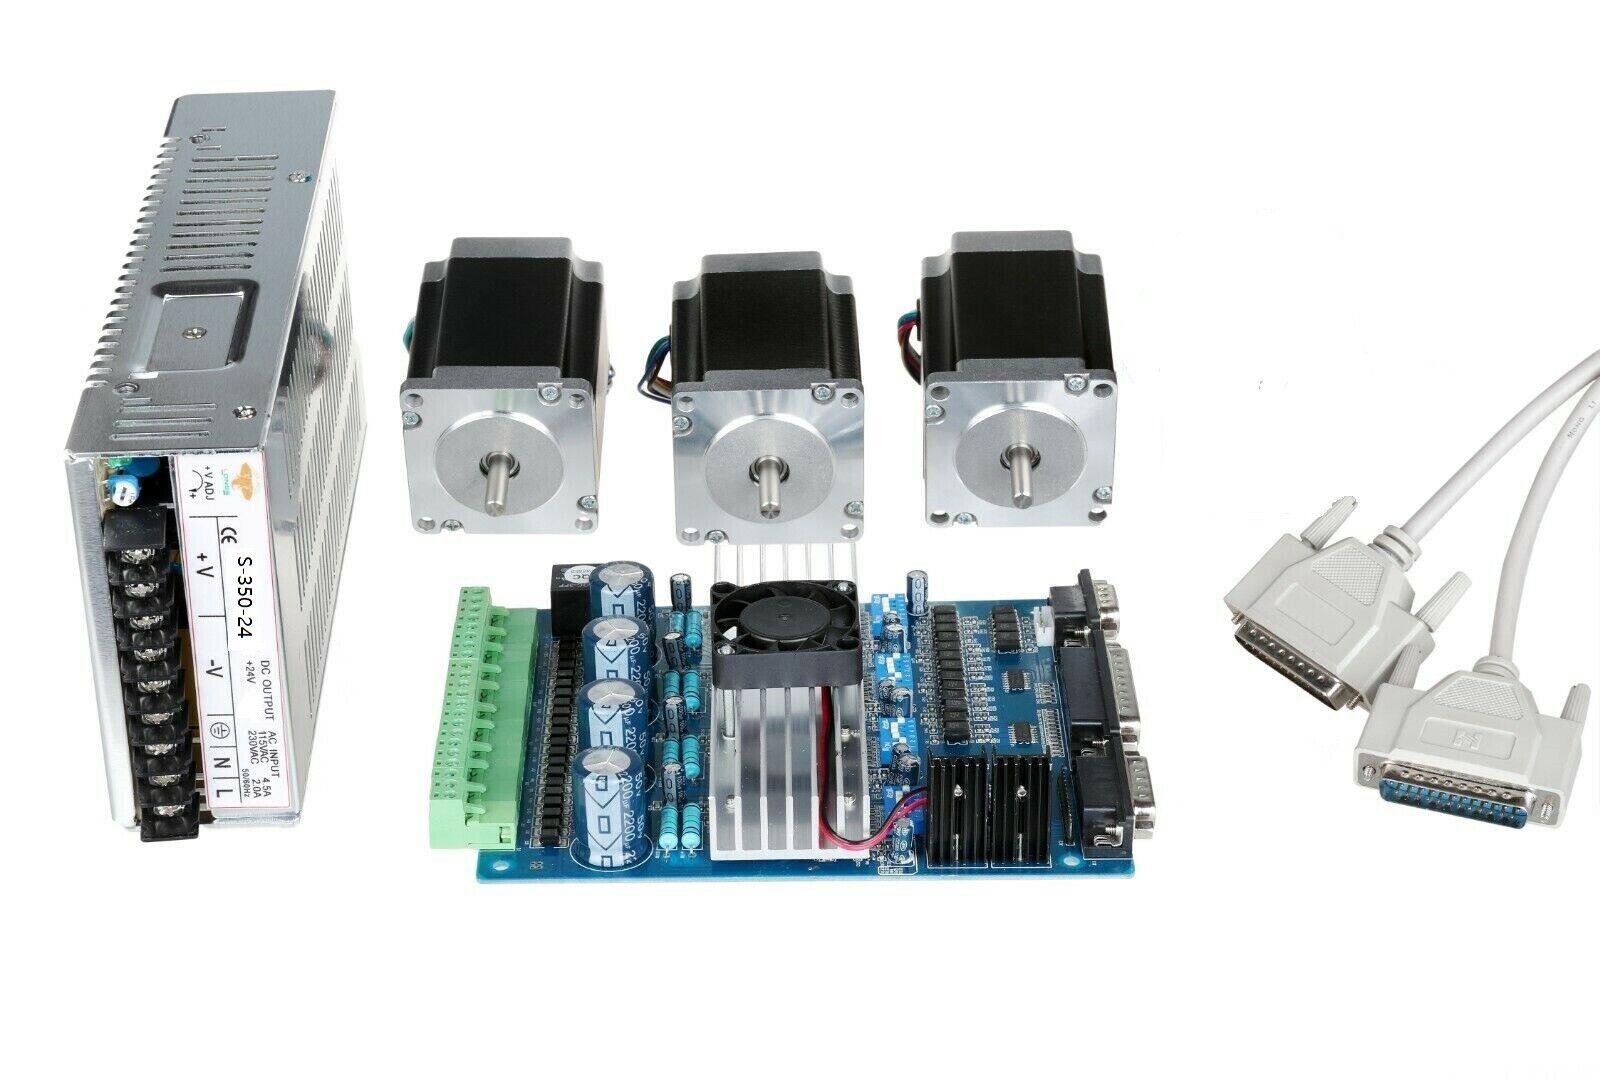 US Nema23 Stepper Motor 23HS8430 270oz-in 4leads&BOARD TB6560 CNC Router Kit